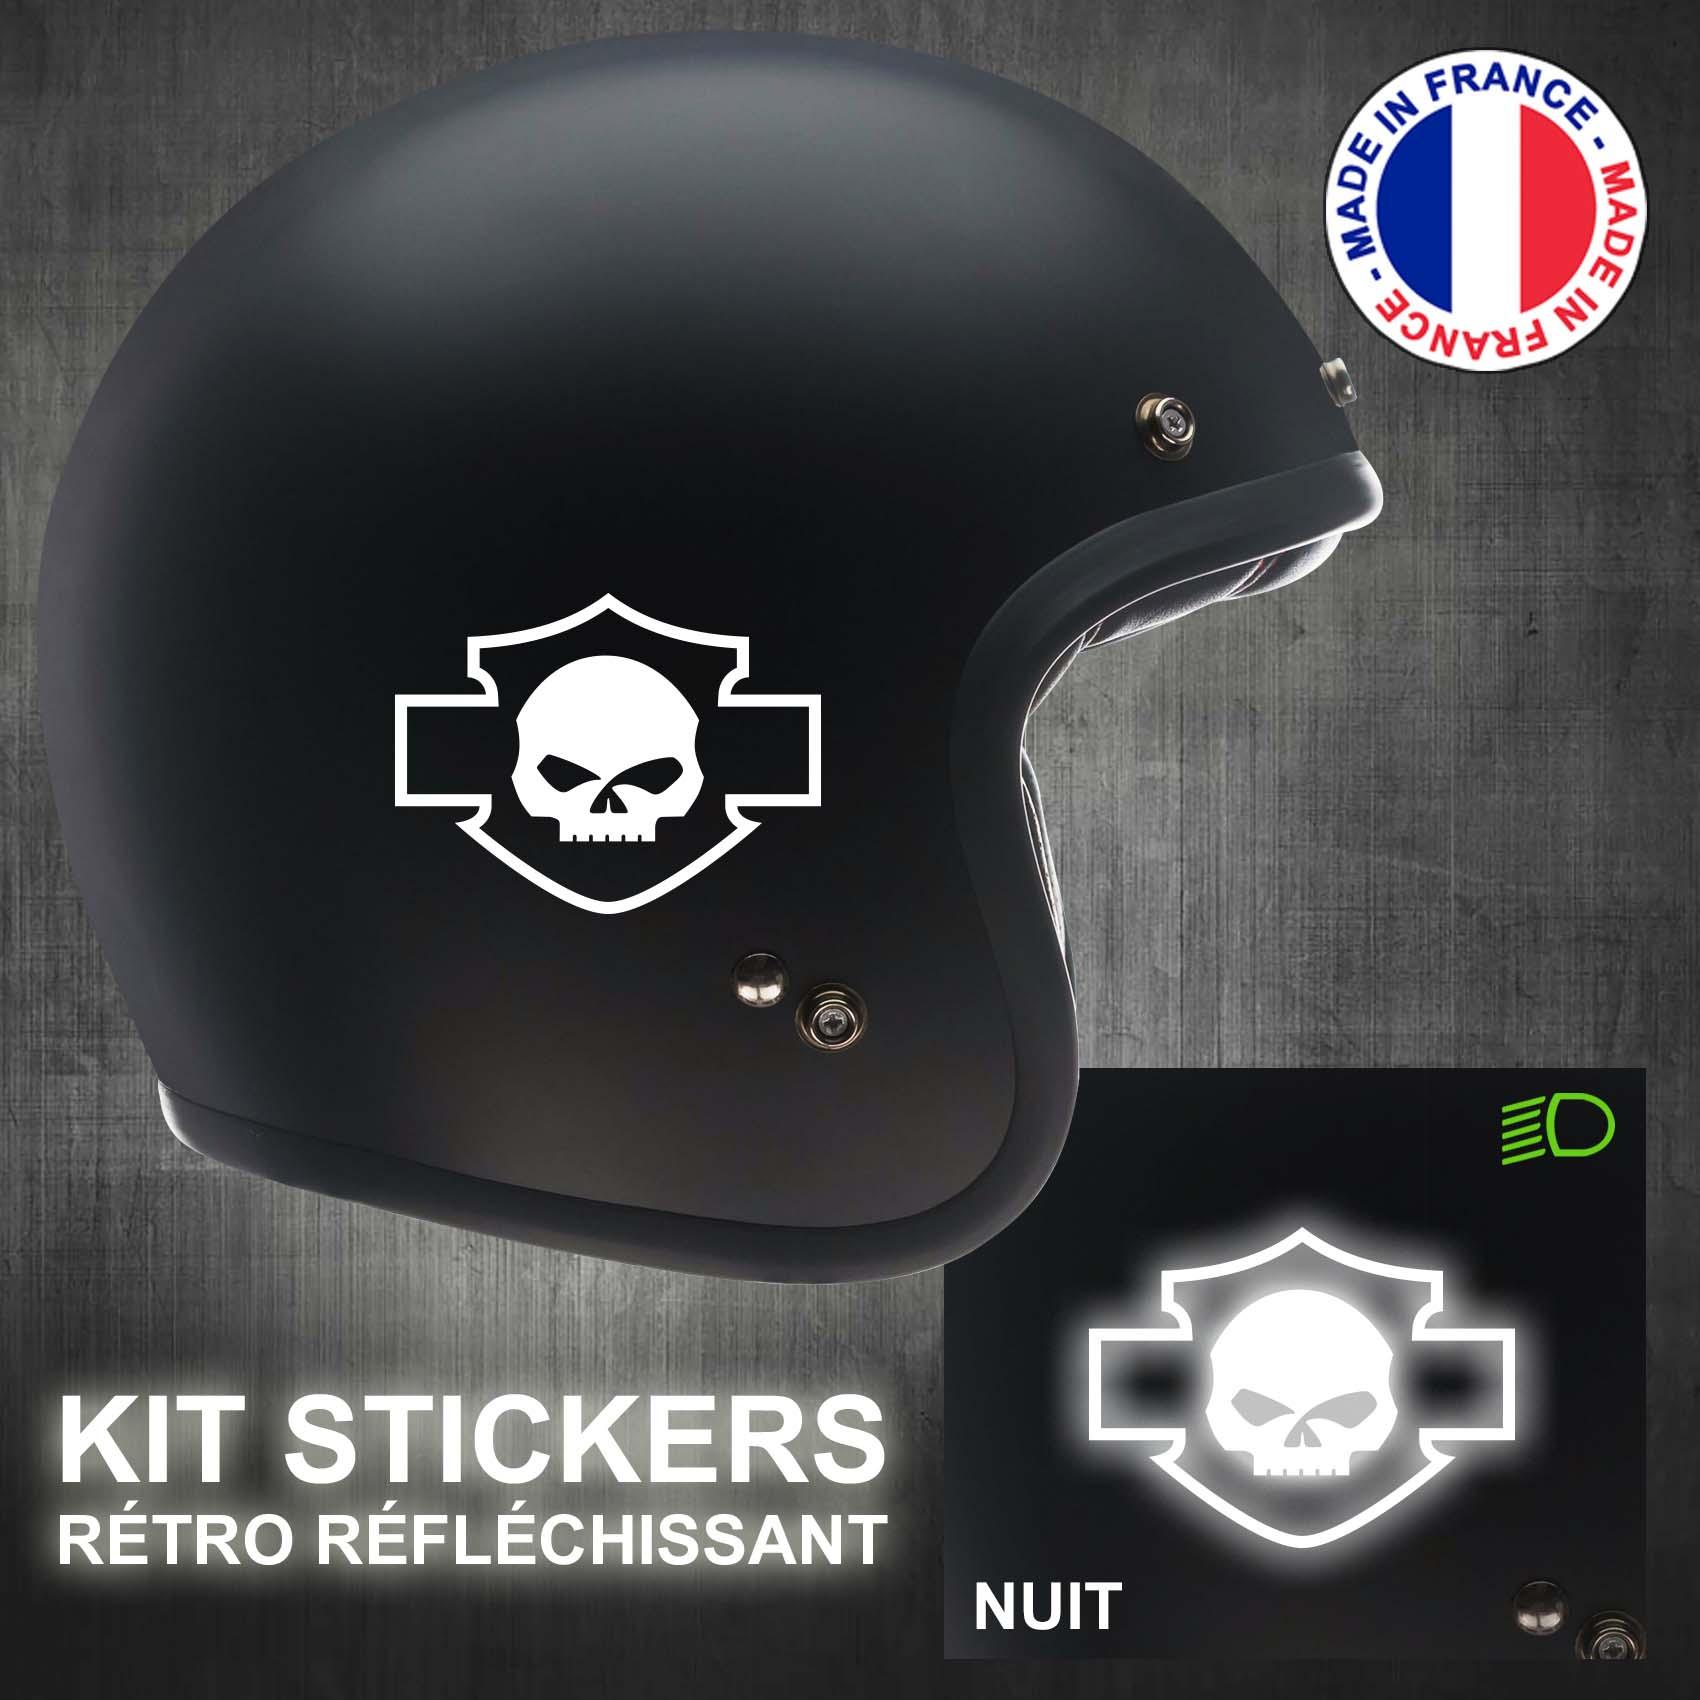 casque ref4 Stickers Moto Guzzi Autocollant moto deux roues scooter